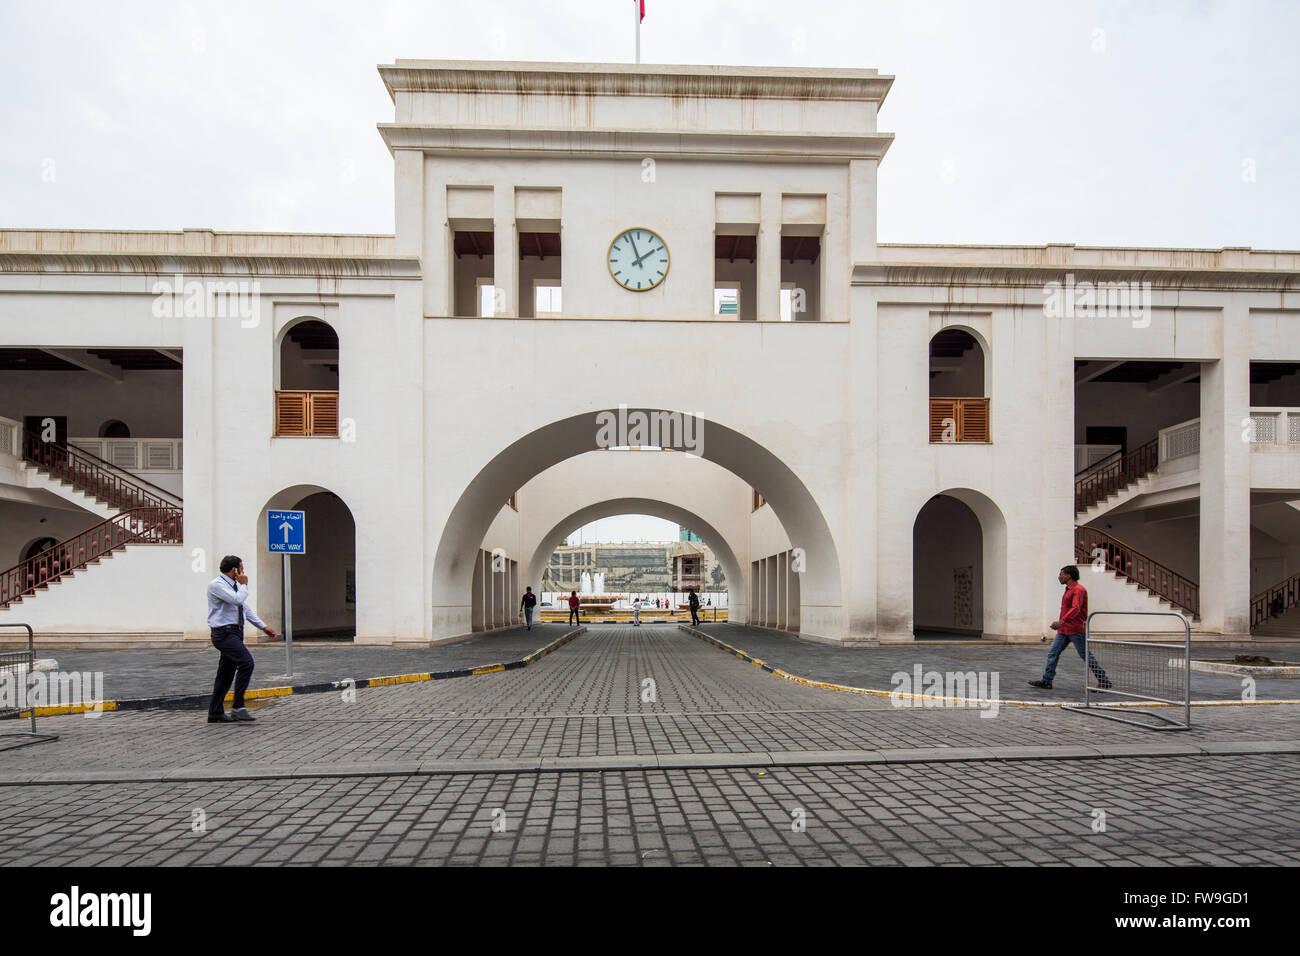 Bab Al Bahrain arched gateway, Manama, Bahrain - Stock Image